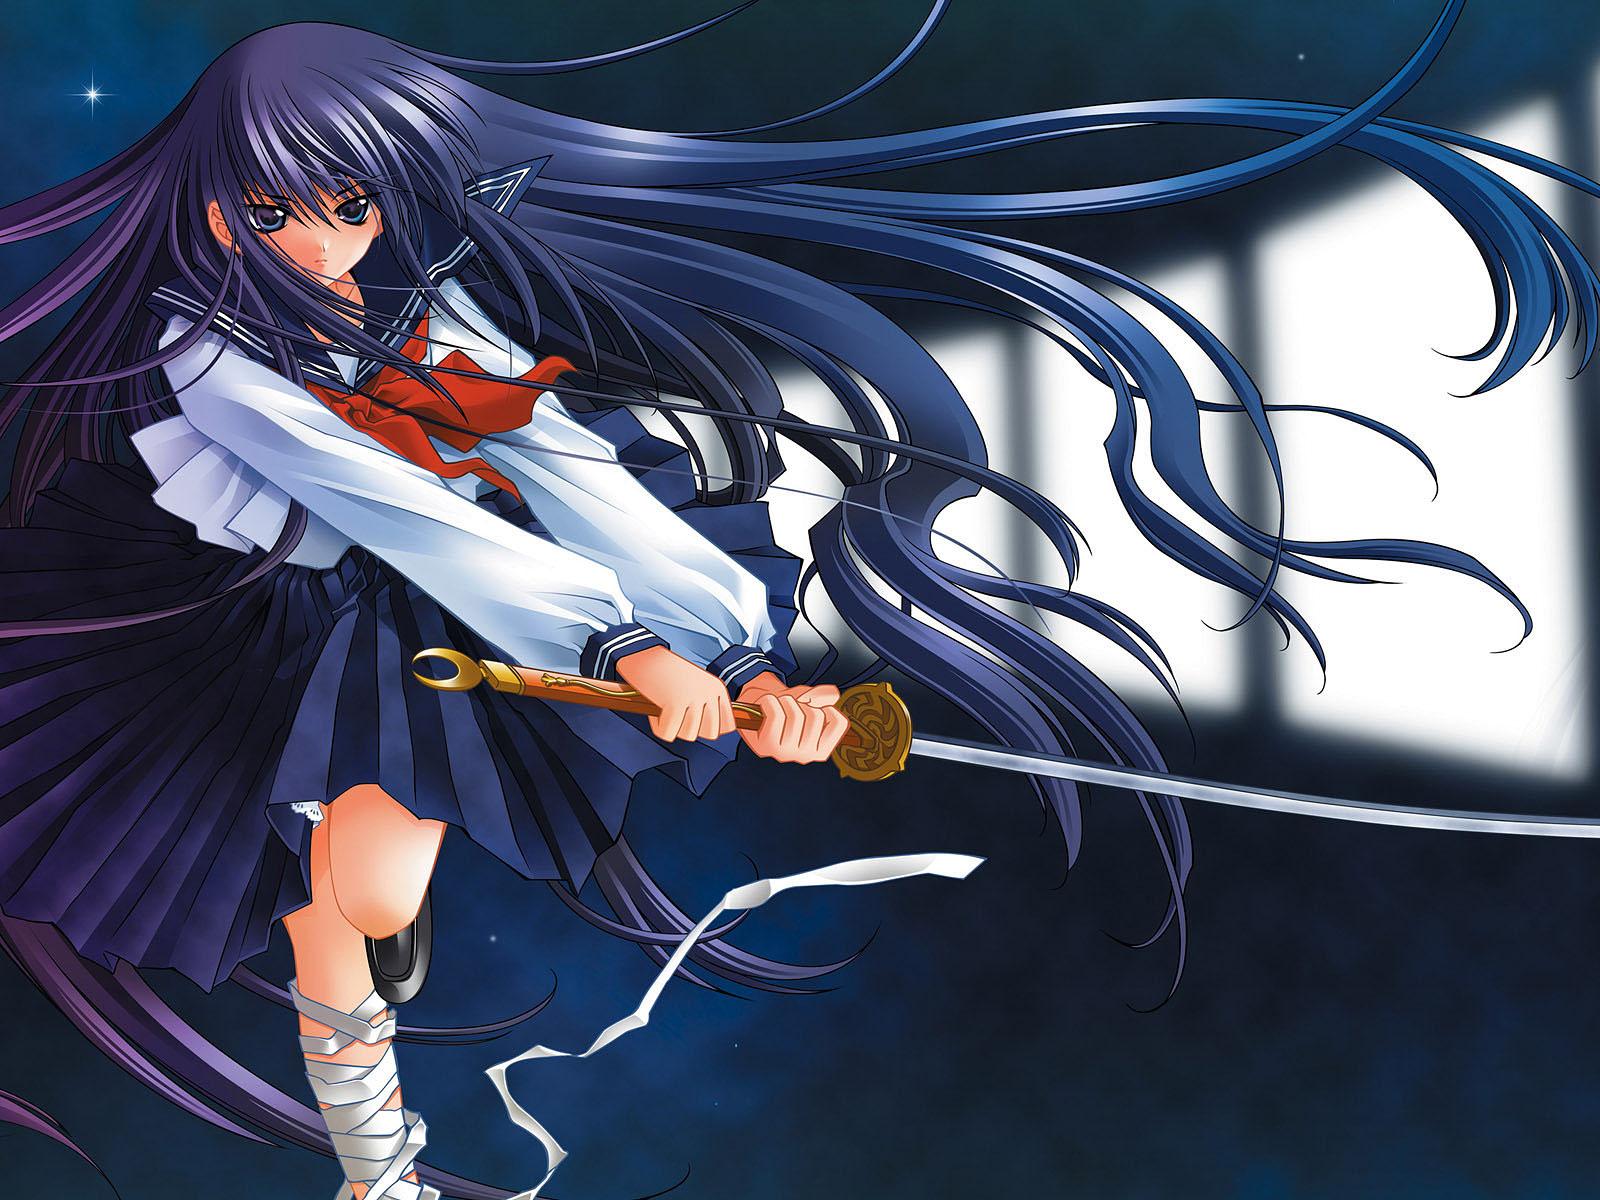 Image Result For Top Anime Girl Wallpaper